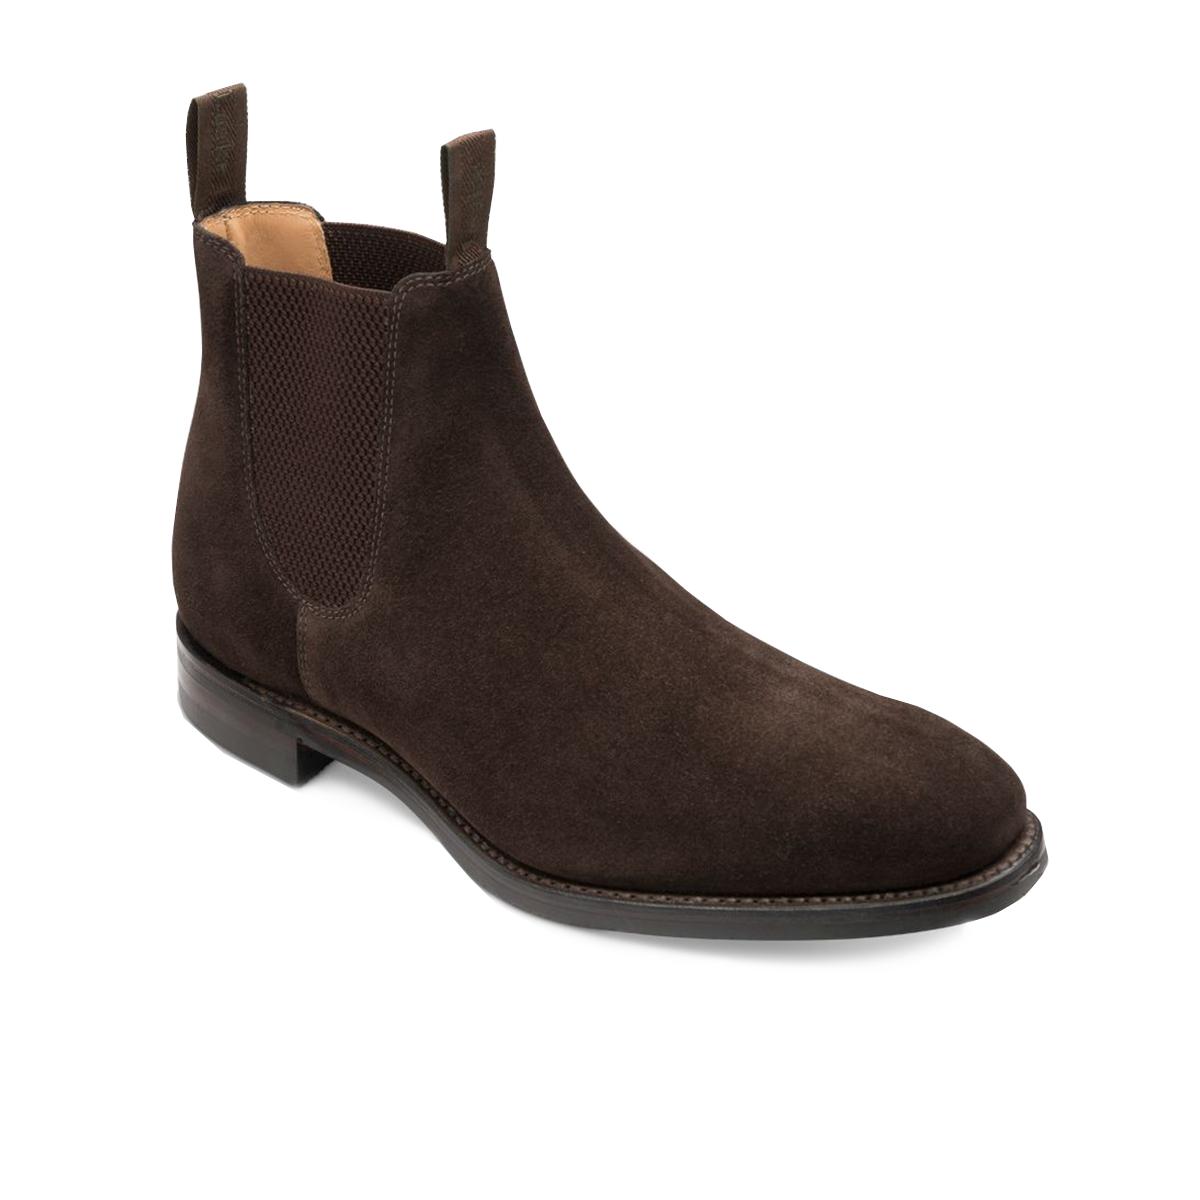 Loake-Chatsworth-Boot –Dark-Brown-Wax-Suede